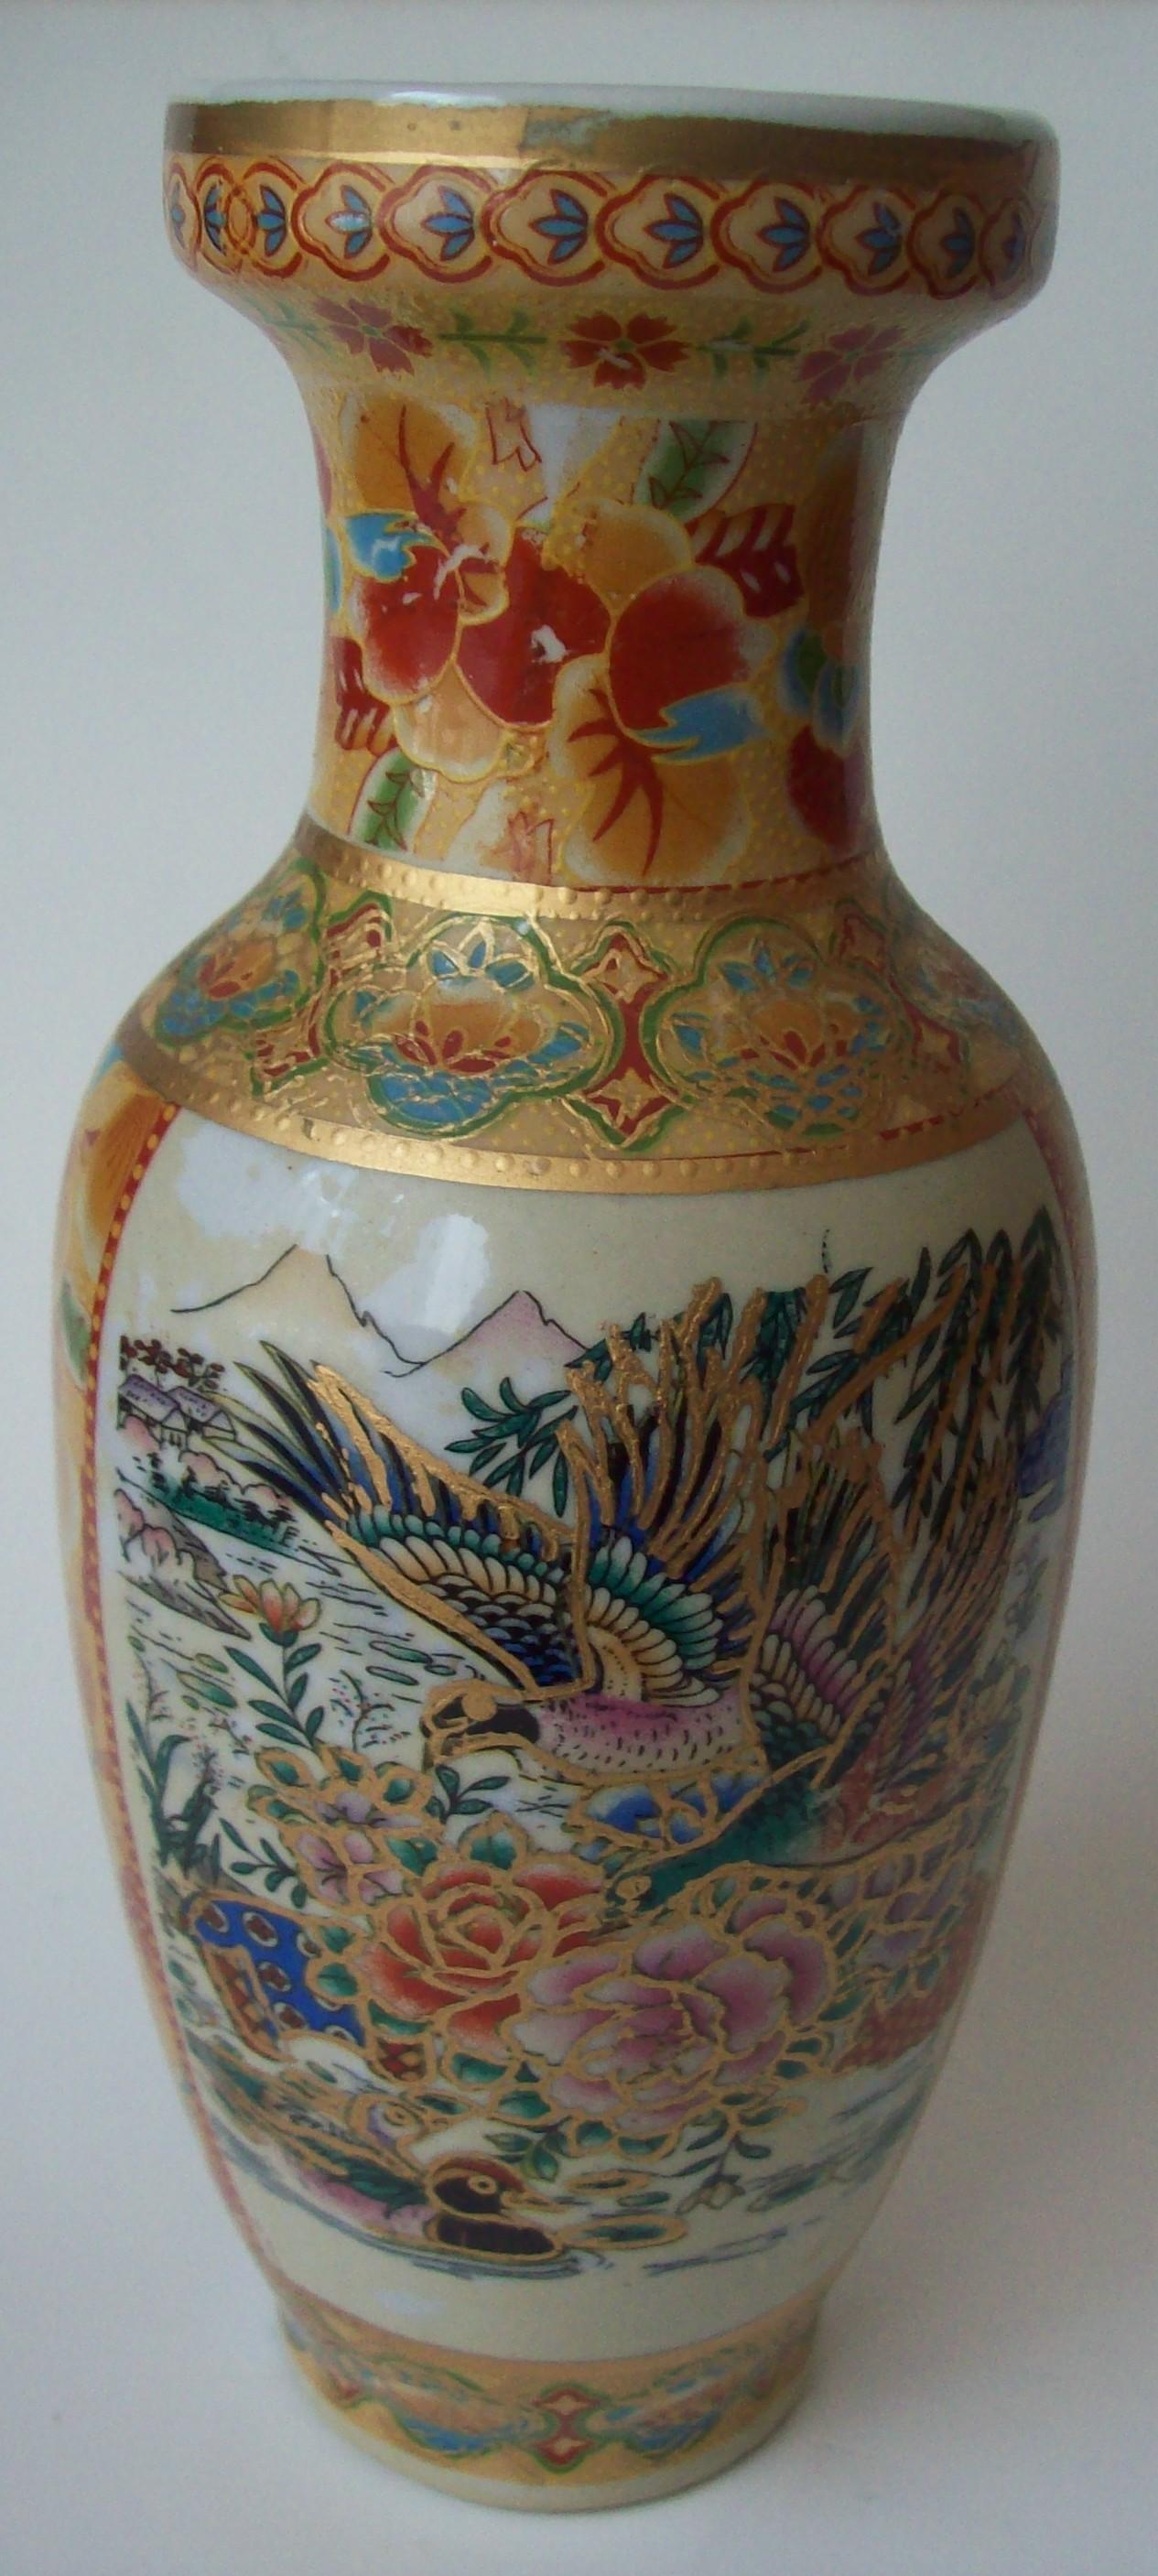 Satsuma Vase Antique Appraisal Instappraisal